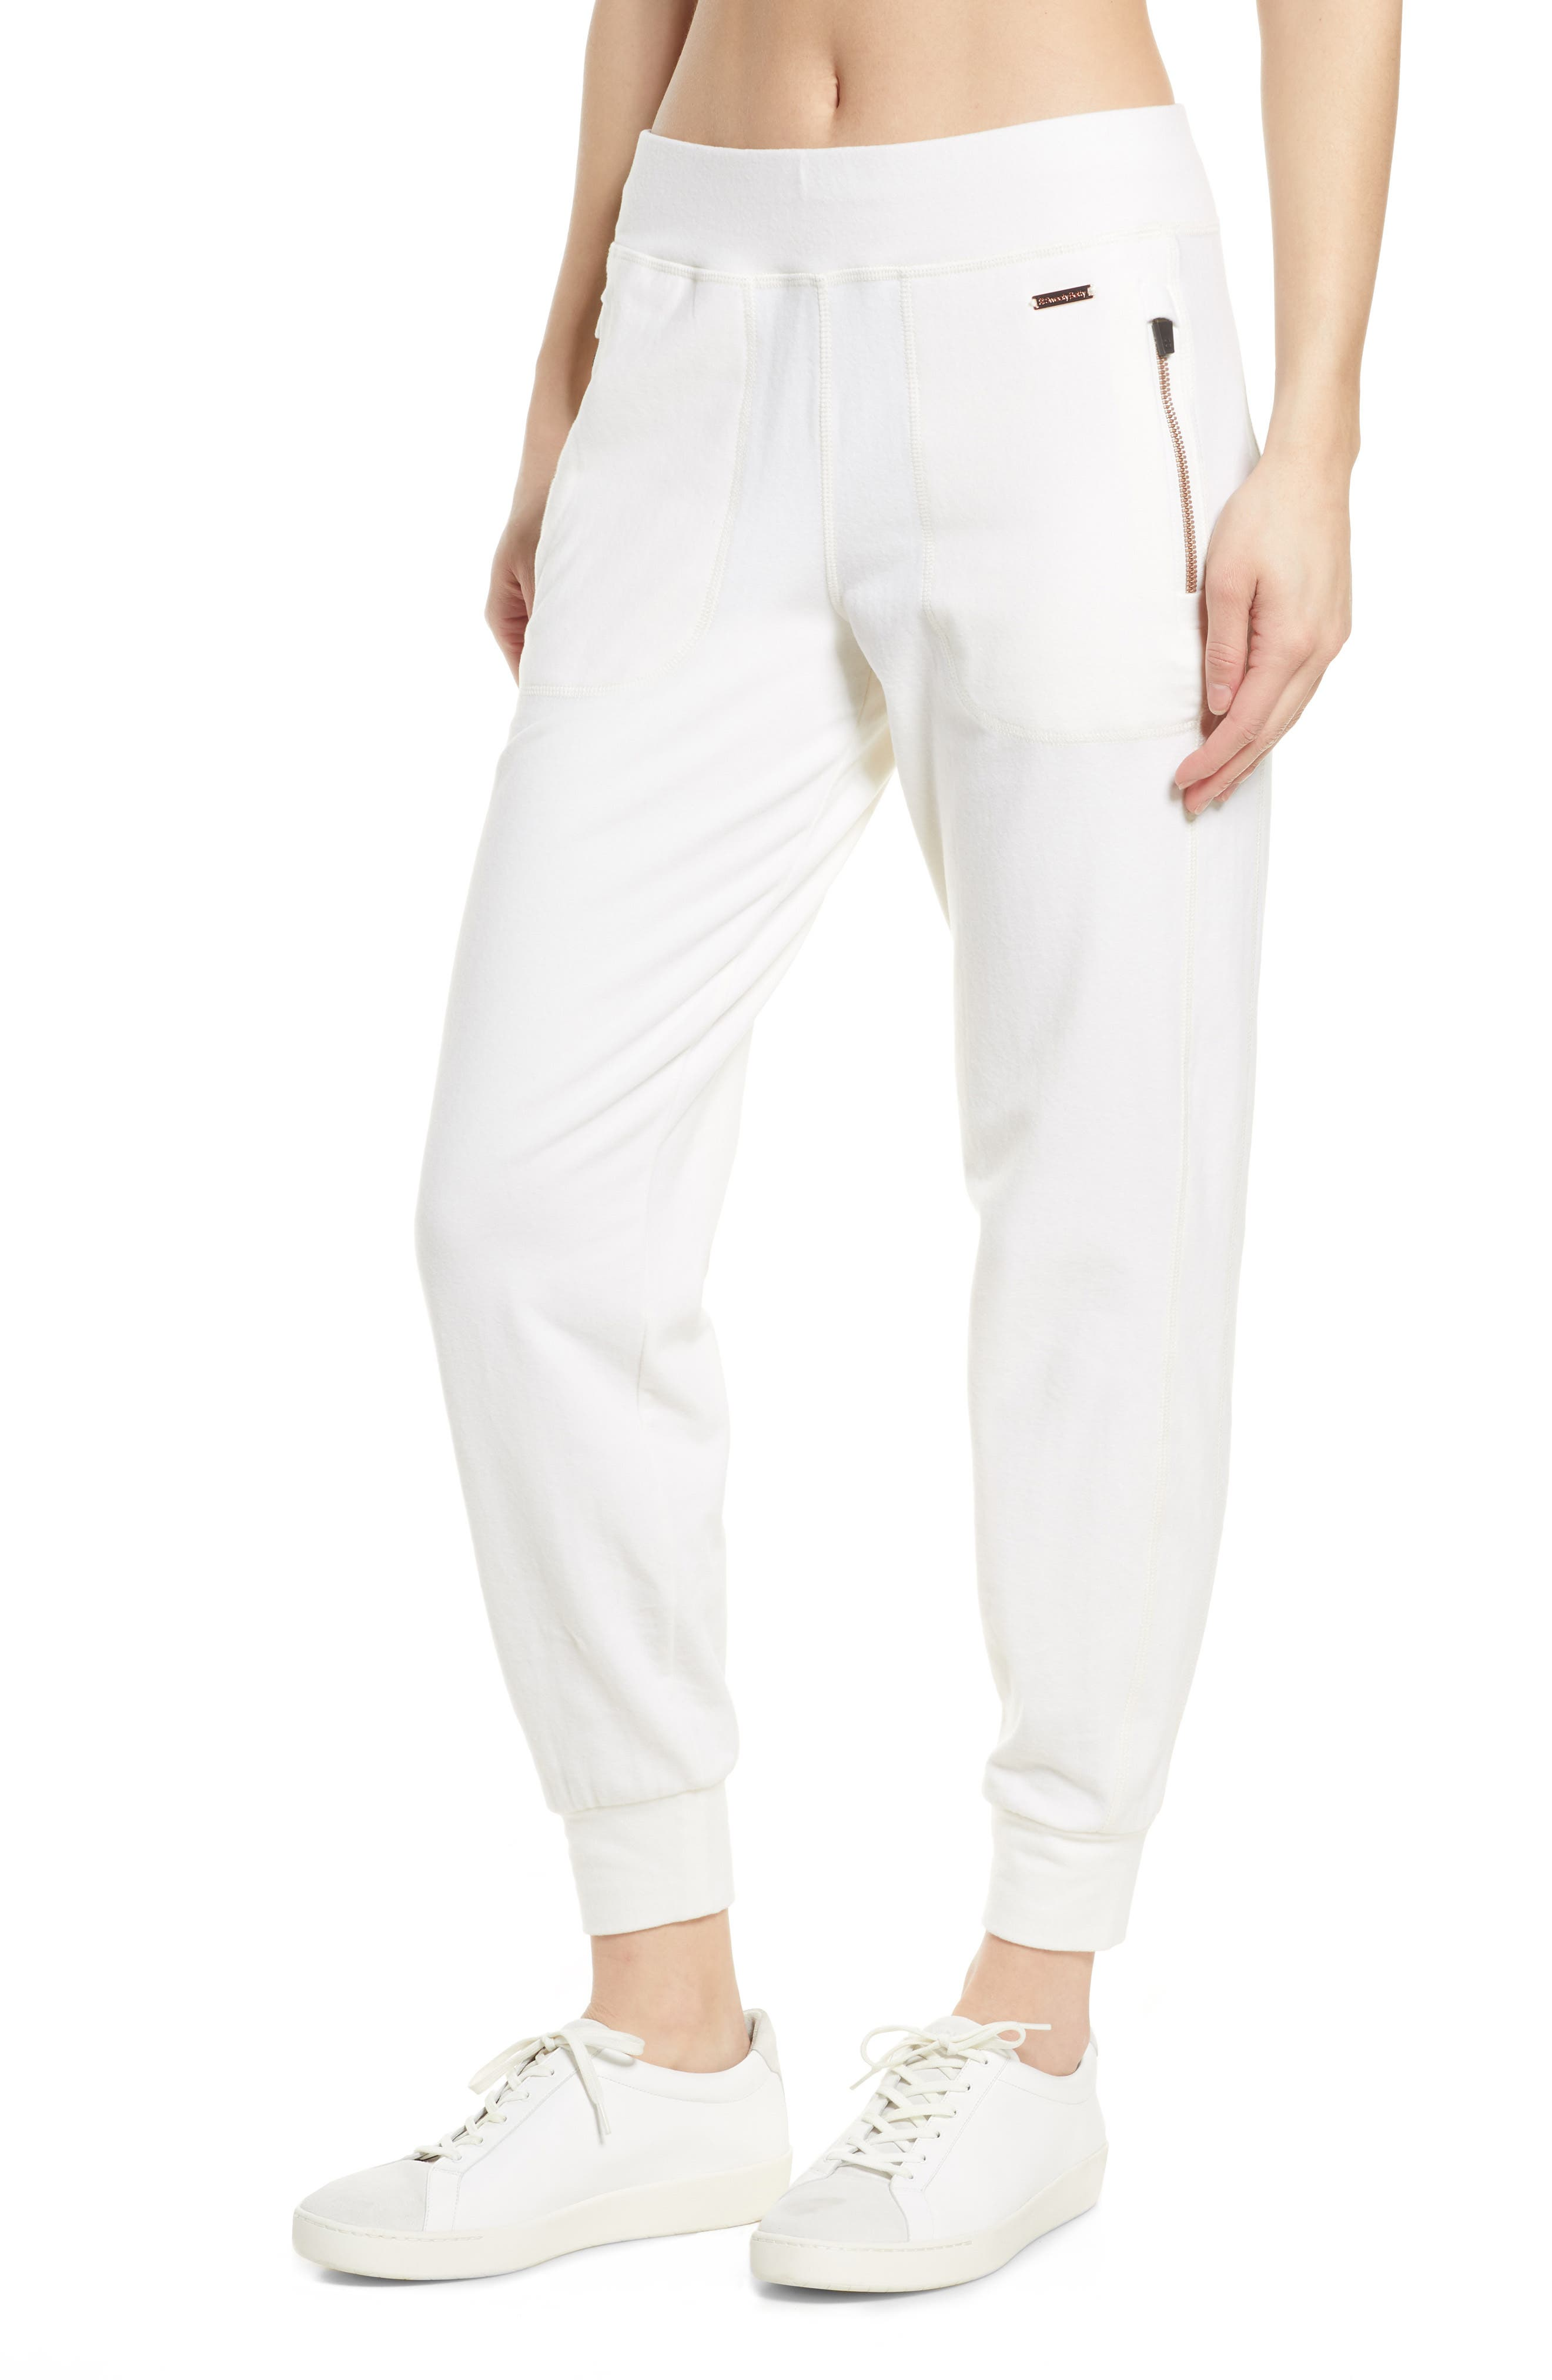 Women's Sweaty Betty Garudasana Luxe Sweatpants